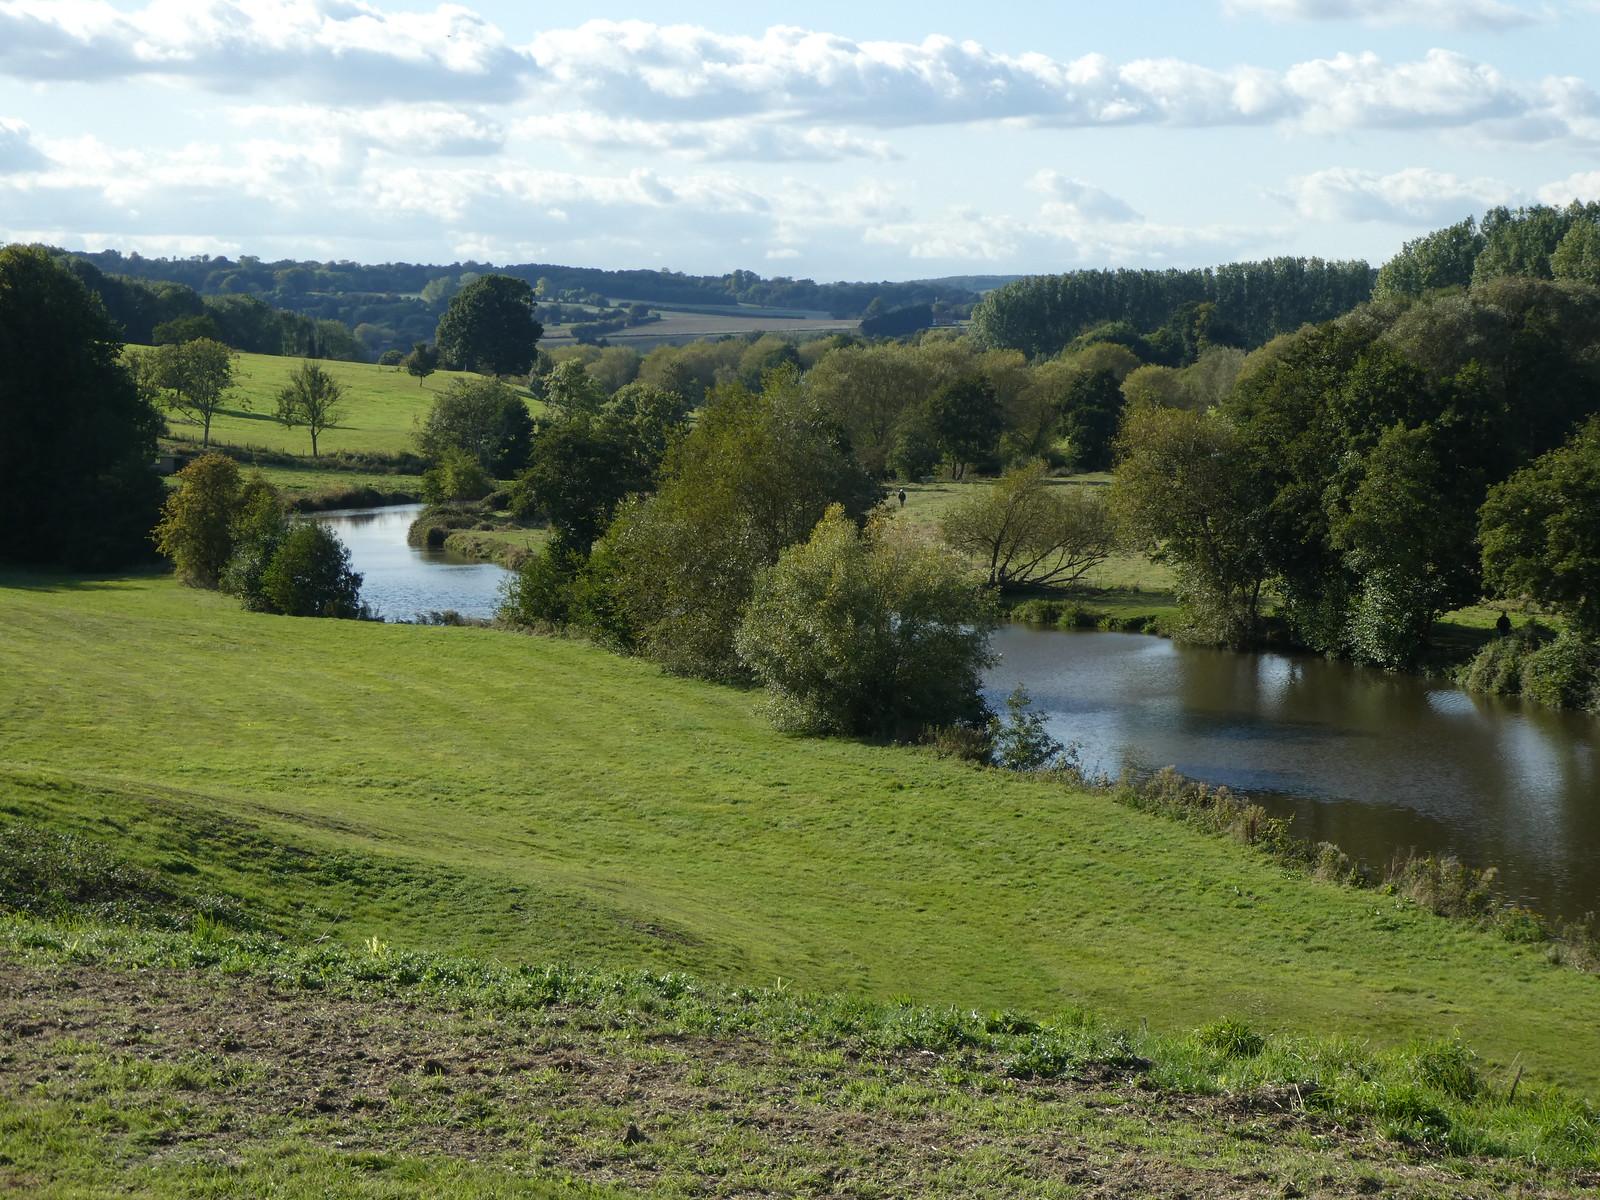 The view from near Tutsham Hall Wateringbury Circular walk